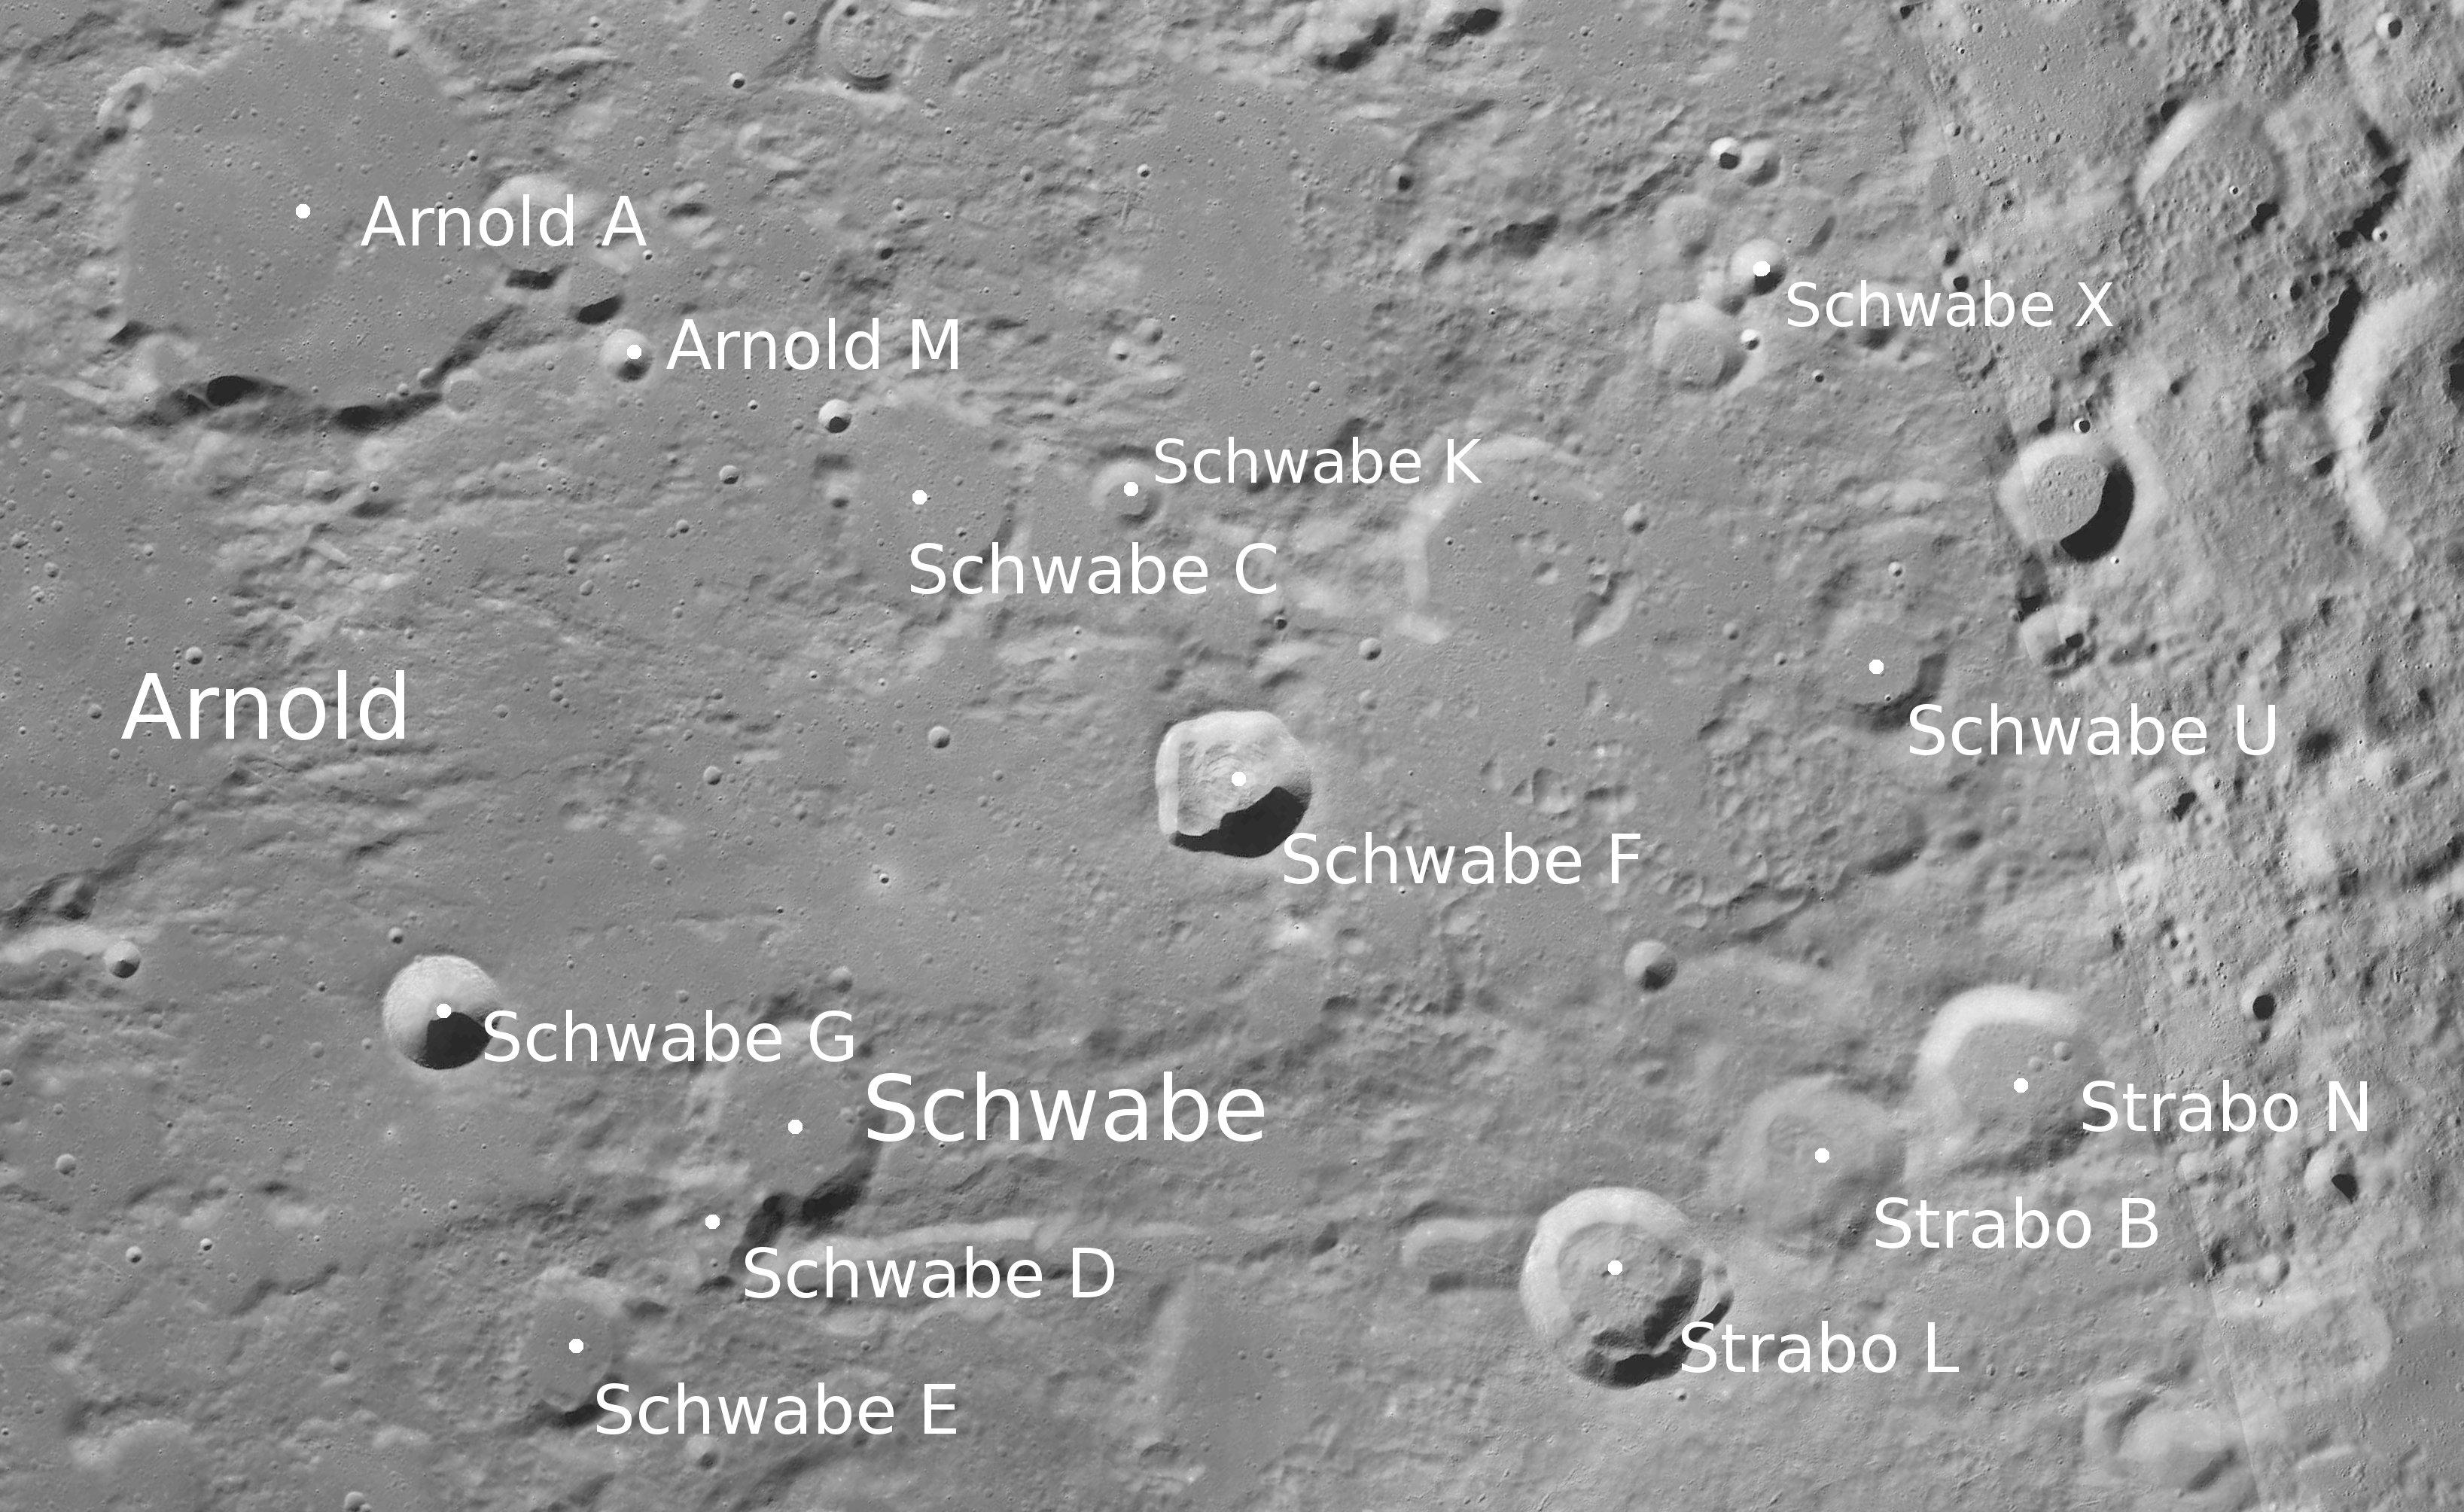 Schwabe - LROC - WAC.JPG